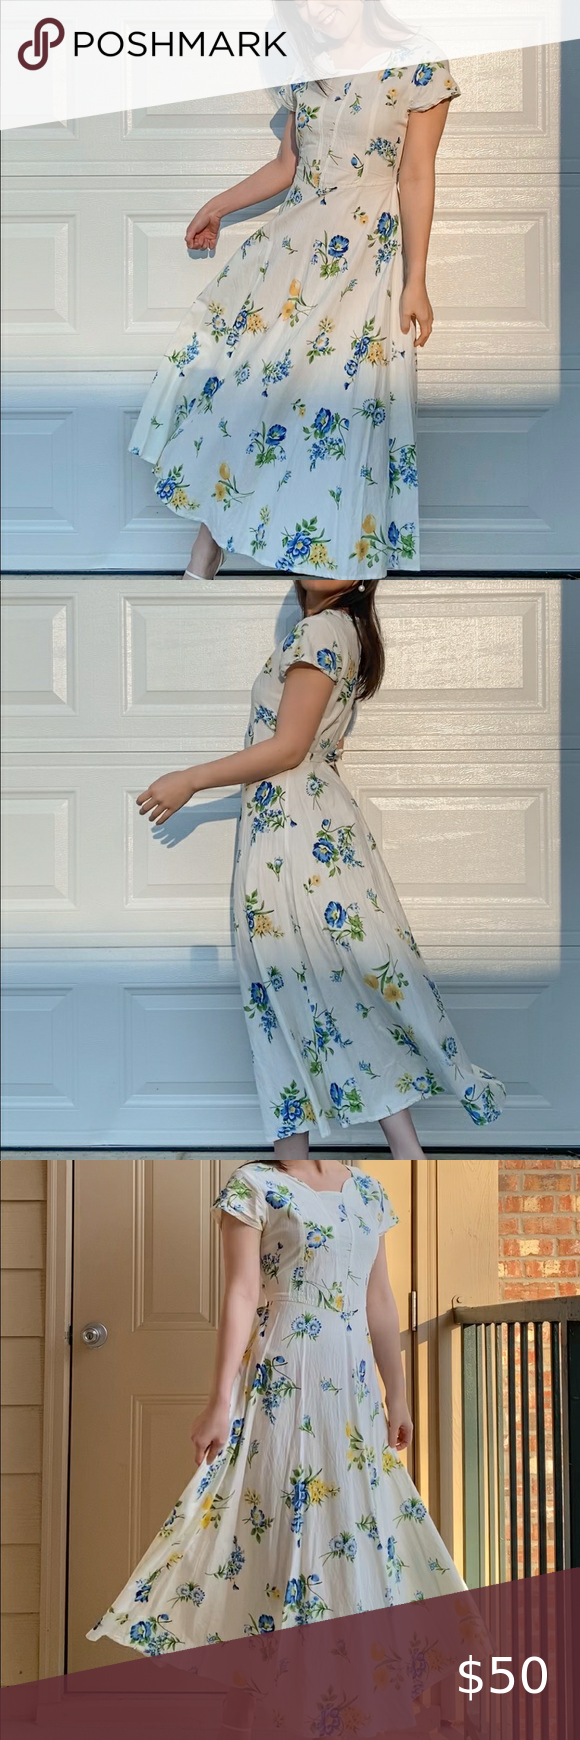 Vintage Blue Yellow Floral Maxi Dress Yellow Floral Maxi Dress Vintage Maxi Dress Floral Maxi Dress [ 1740 x 580 Pixel ]